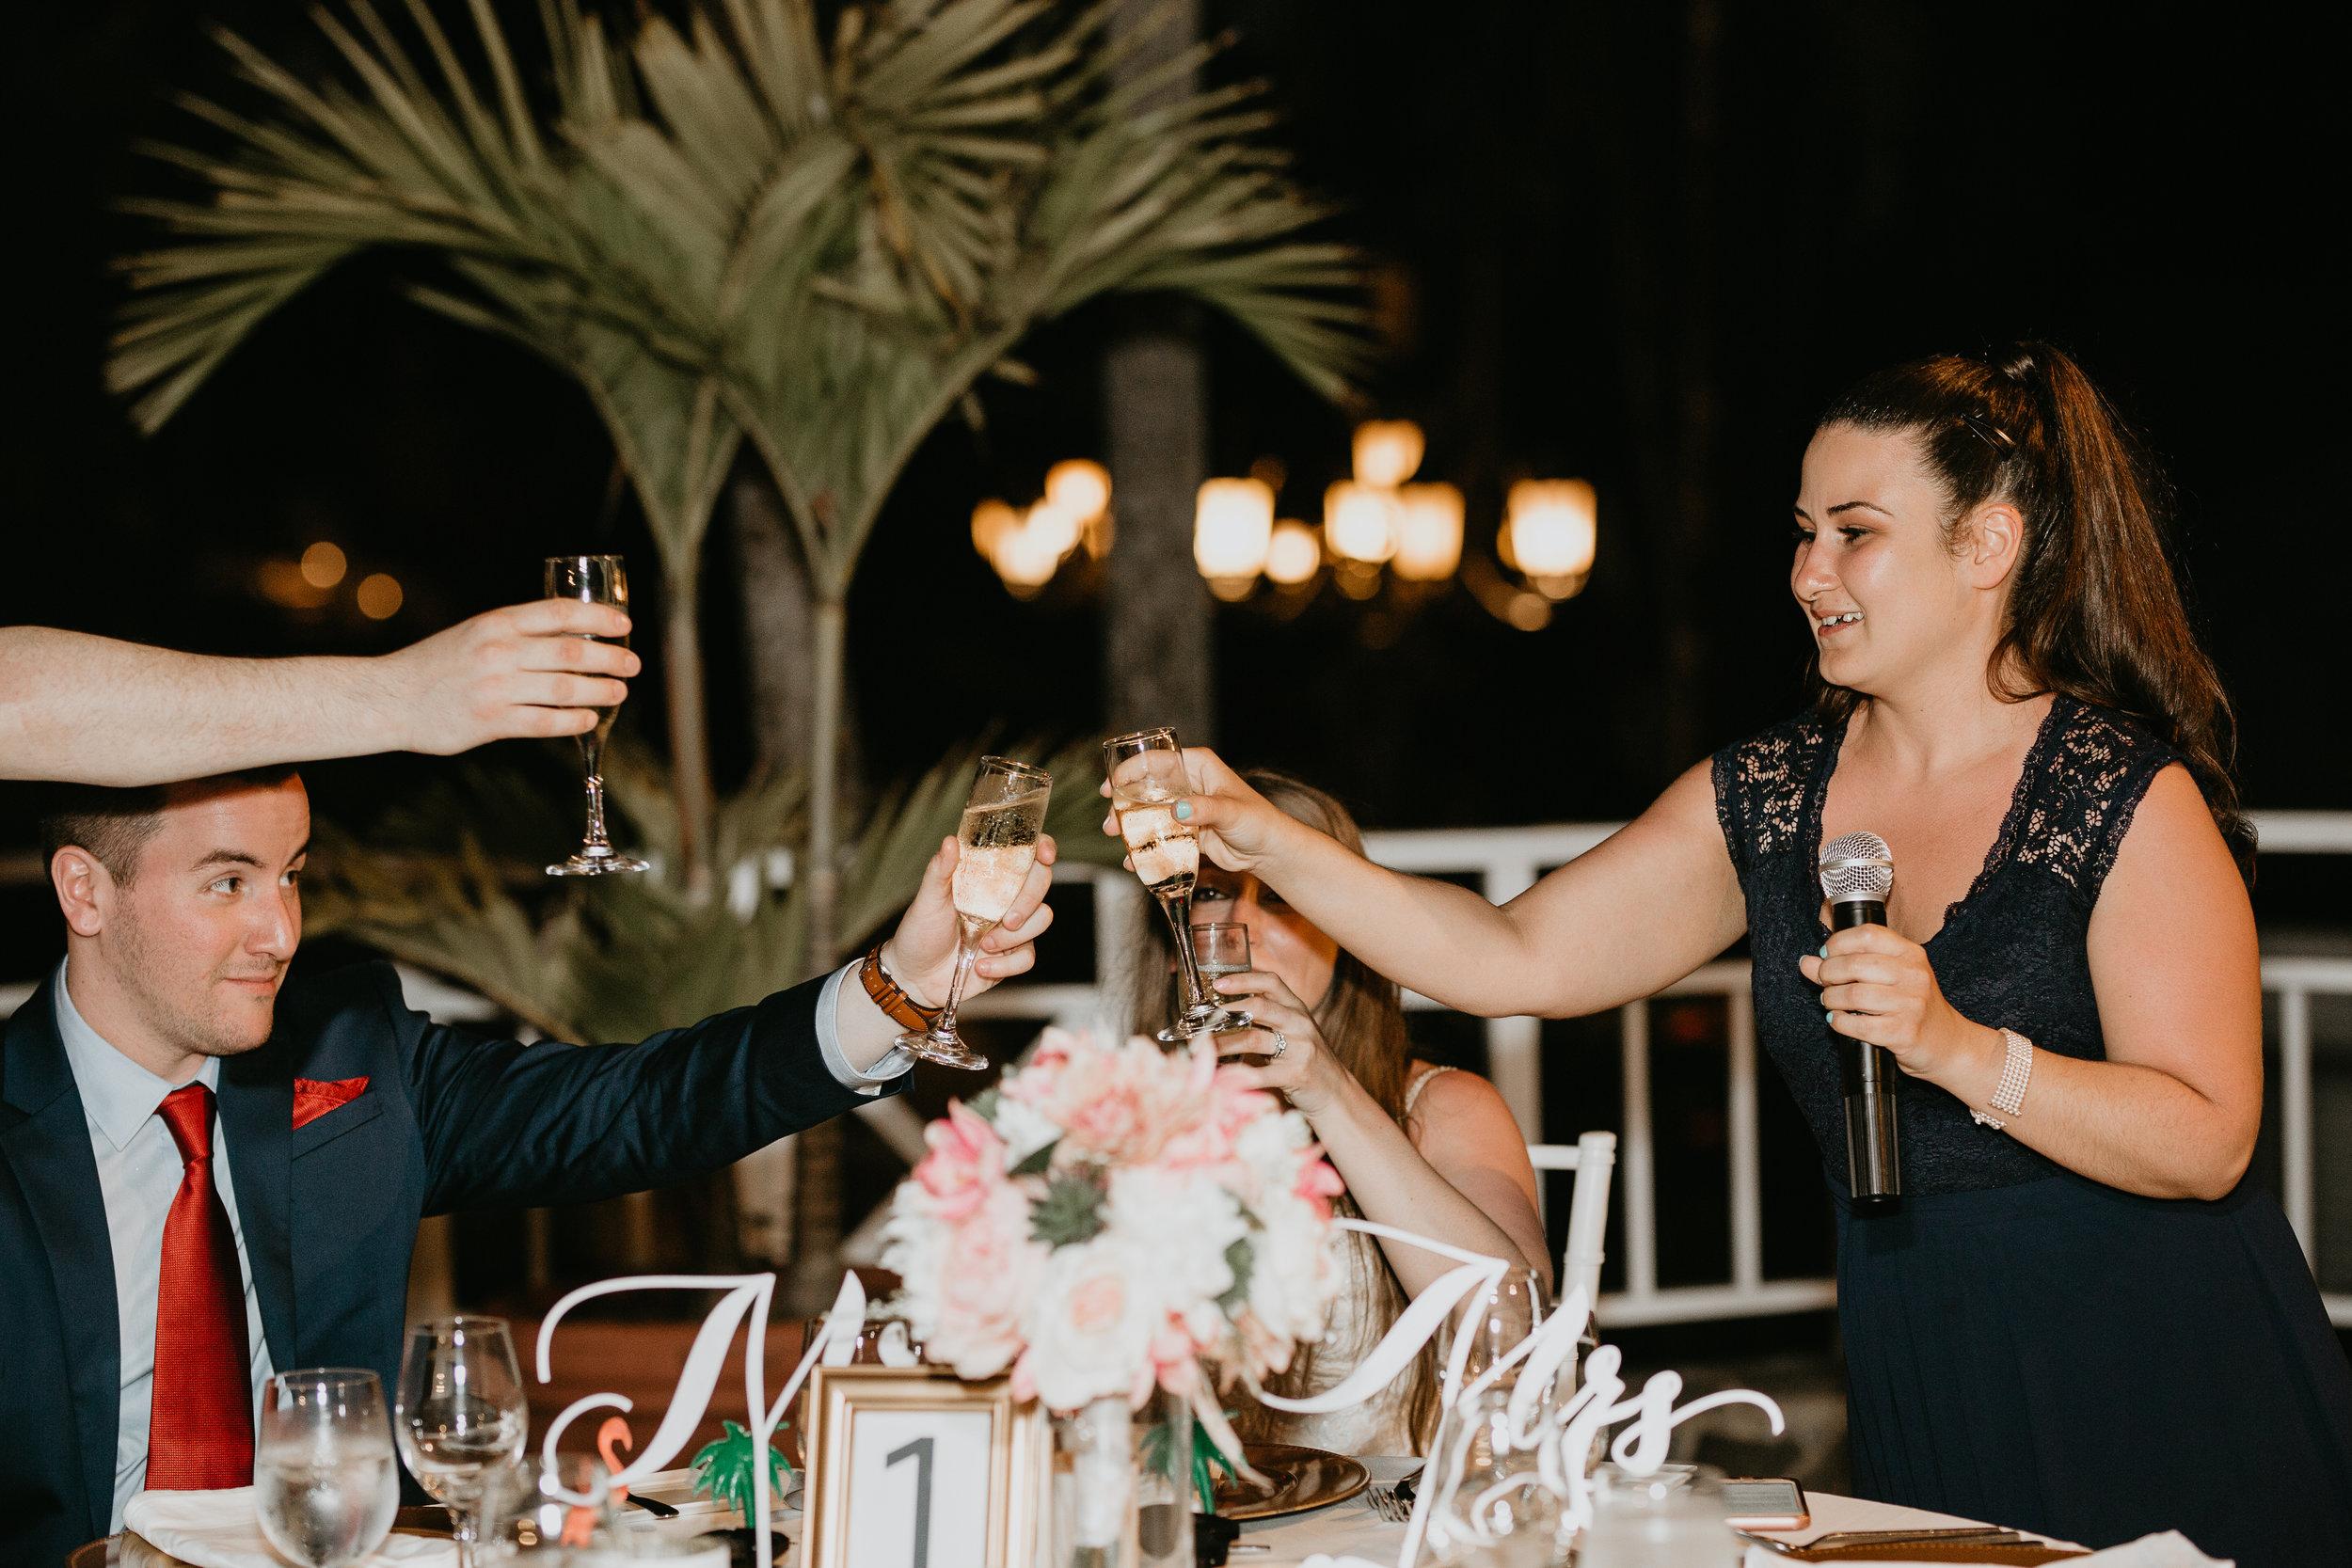 nicole-daacke-photography-destination-wedding-in-st-lucia-sandals-la-toc-intimate-island-wedding-carribean-elopement-photographer-chill-island-wedding-145.jpg